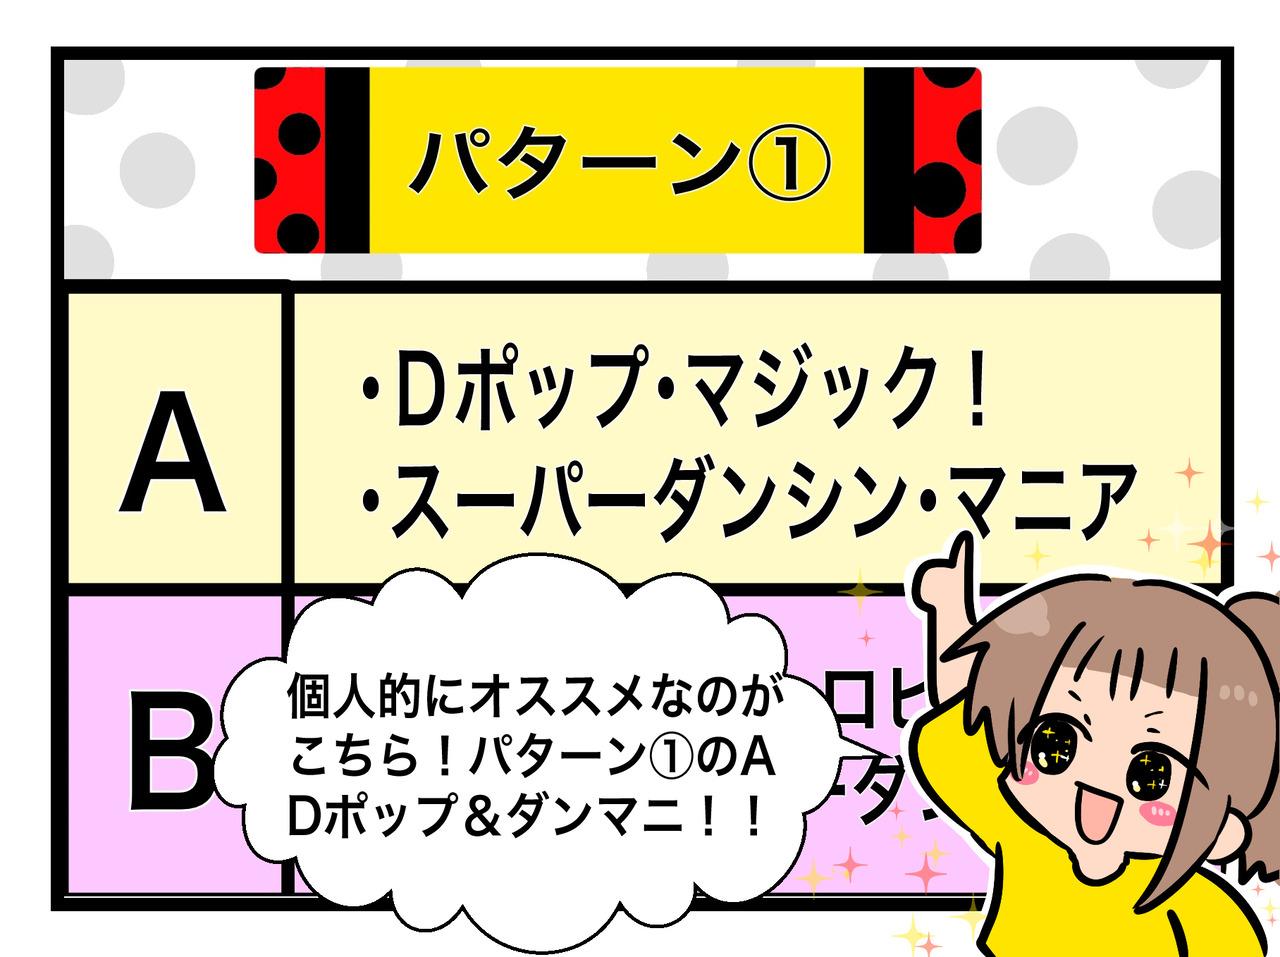 A70460B6-CDA3-43C9-920F-F553E67F1210